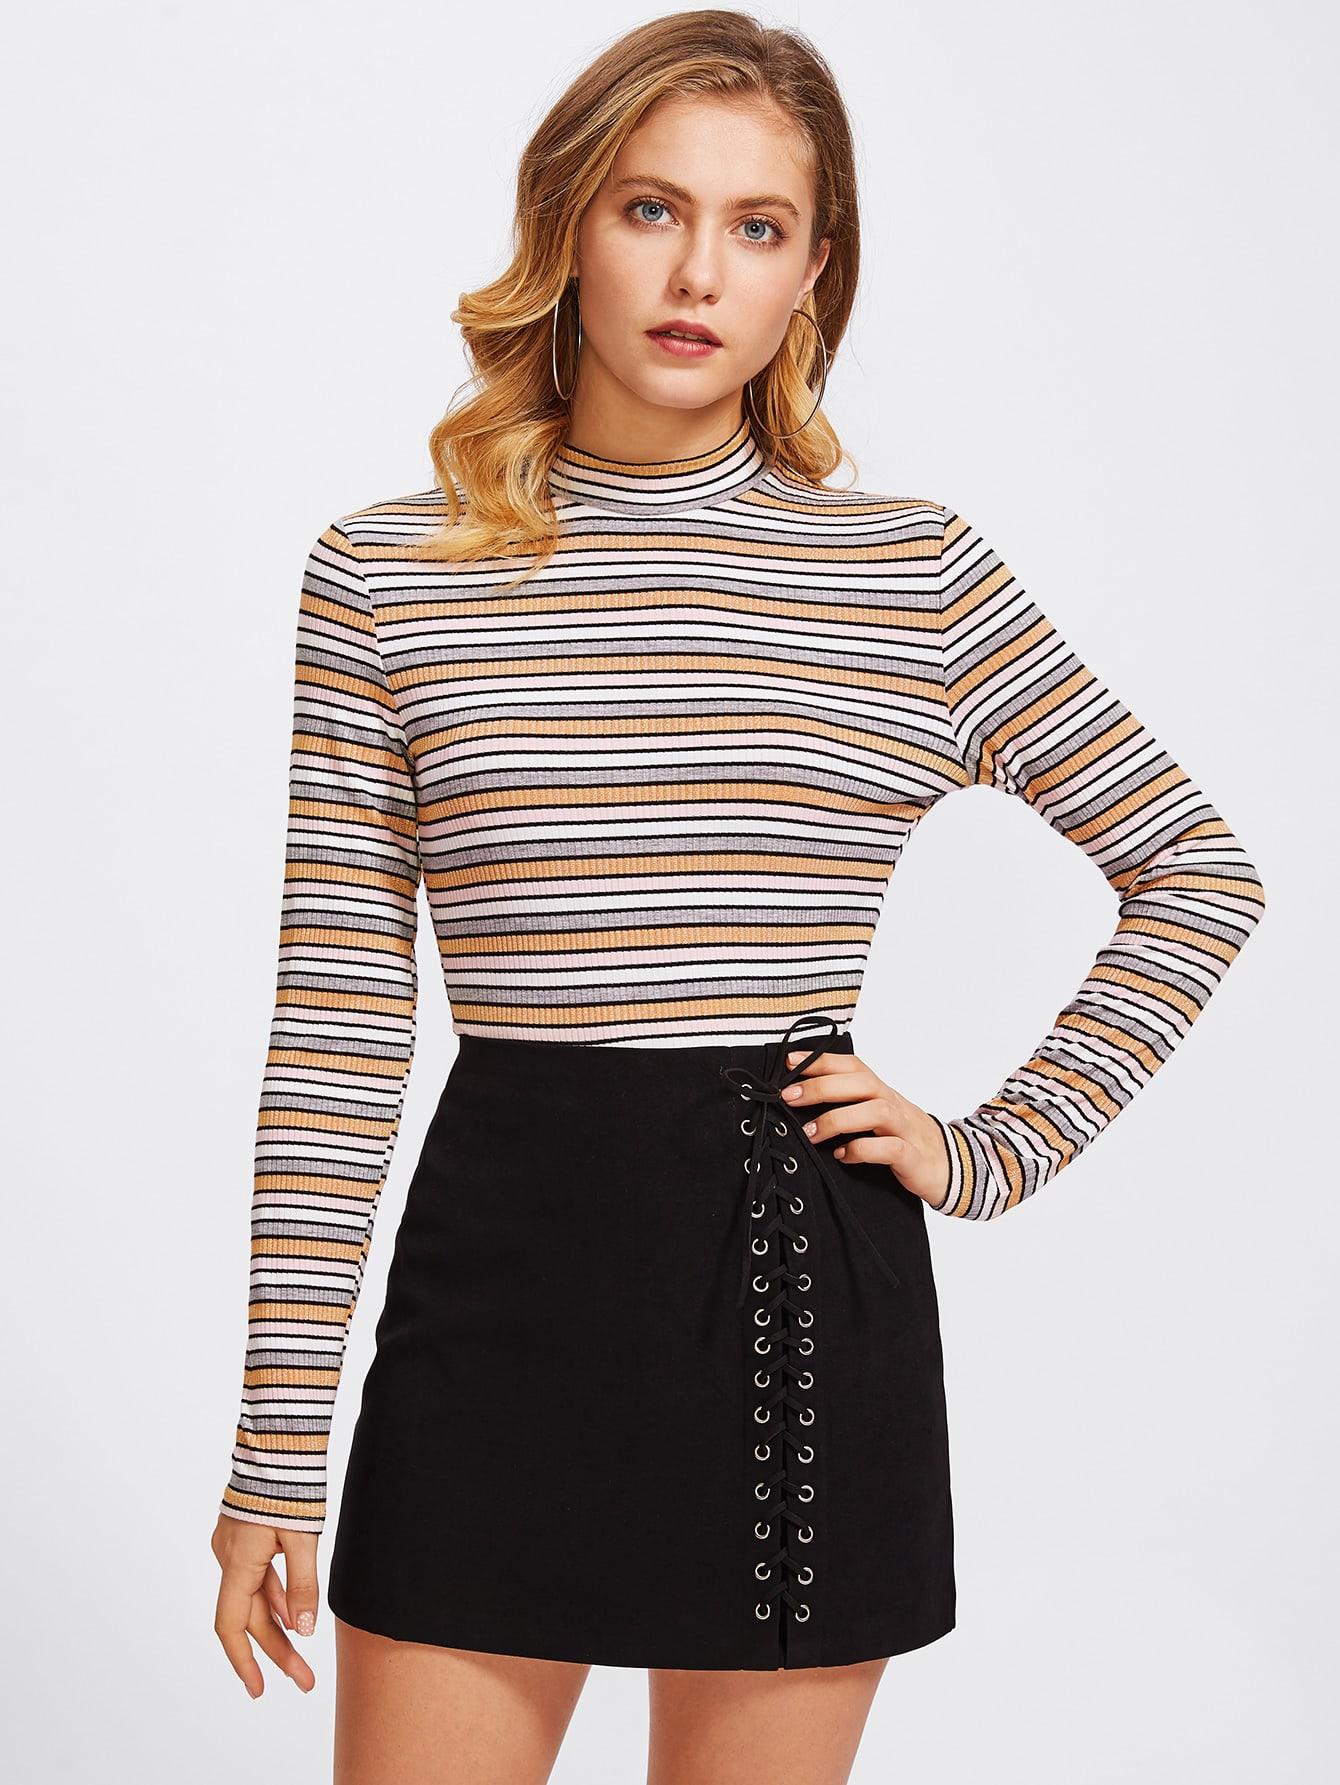 Mock Neck Rib Knit Striped Tee tee170922706